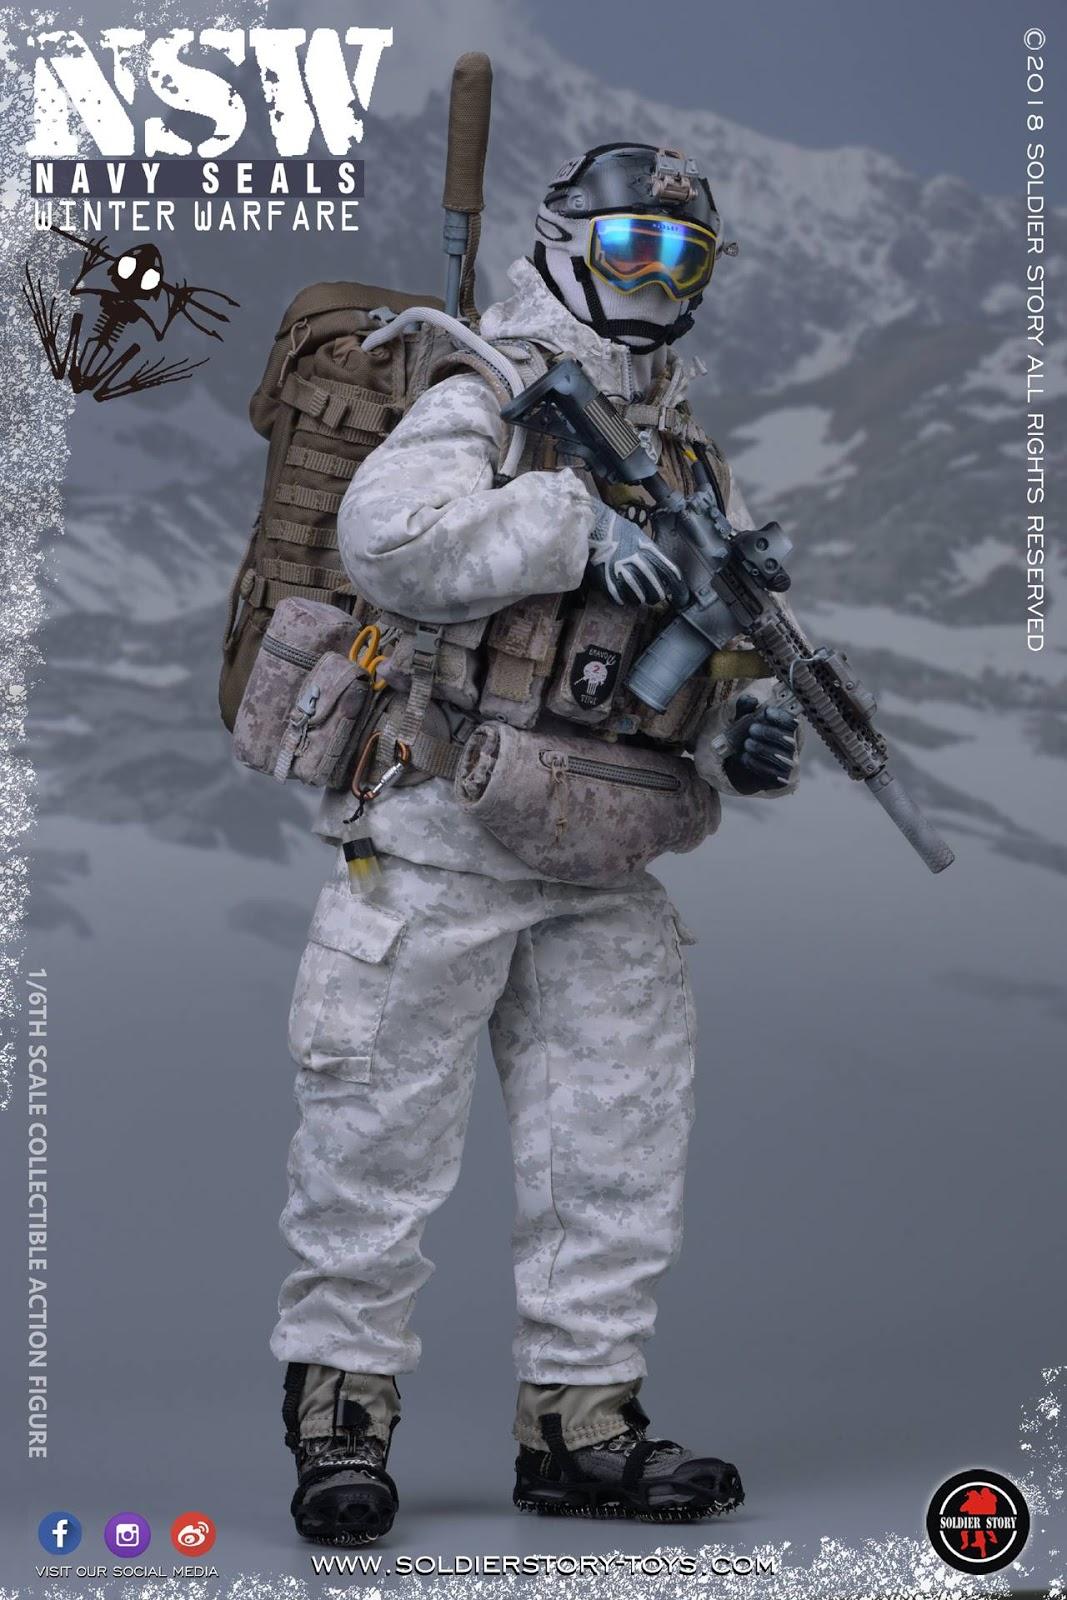 Tan Camo P226 Pistol Seal Team SF 1//6 Scale Mini Times Action Figures